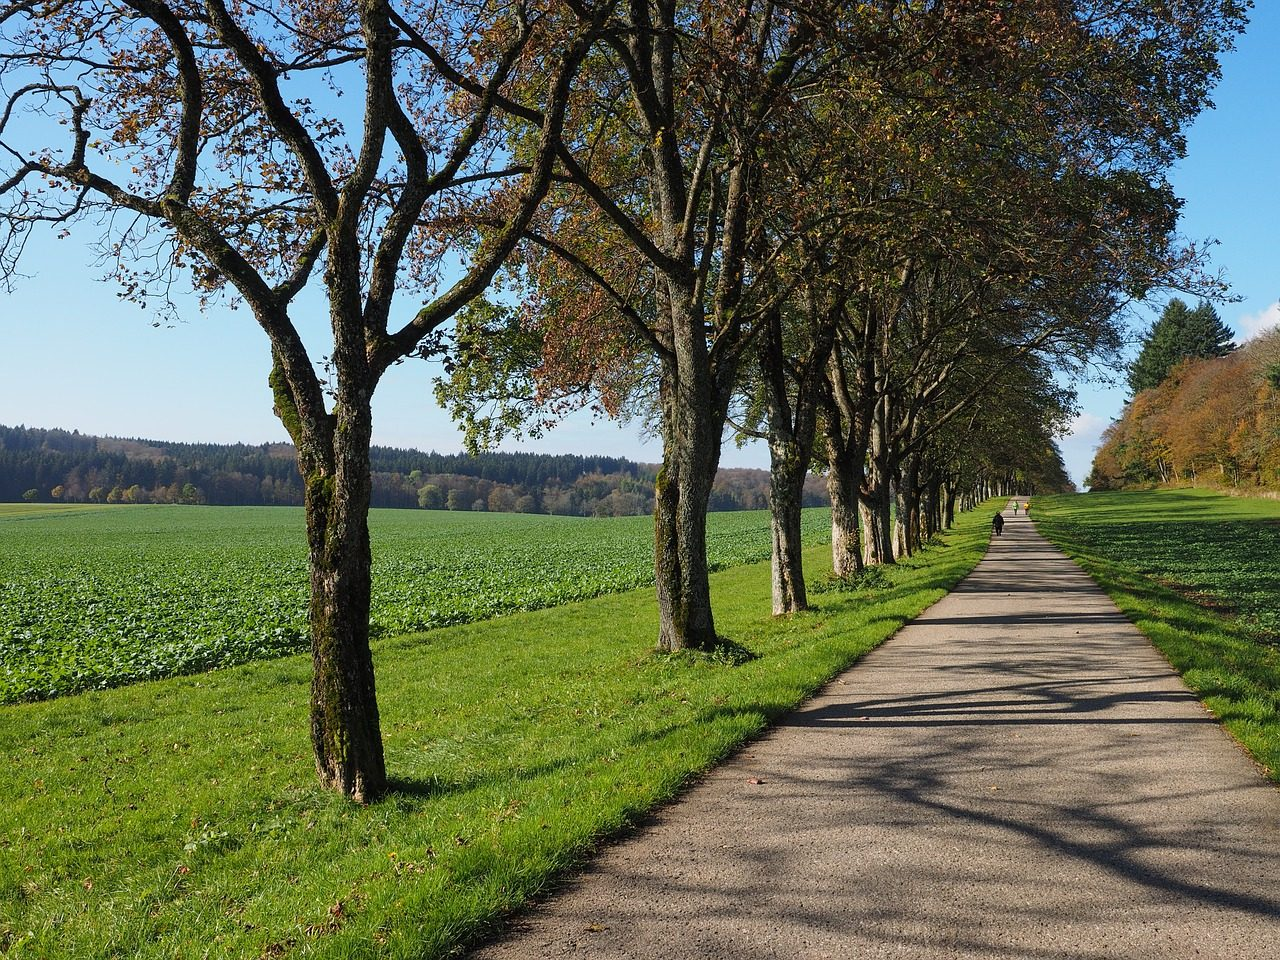 Baumfällungen an Kreisstraßen — Grüne Kreistagsfraktion fordert Nachpflanzungen